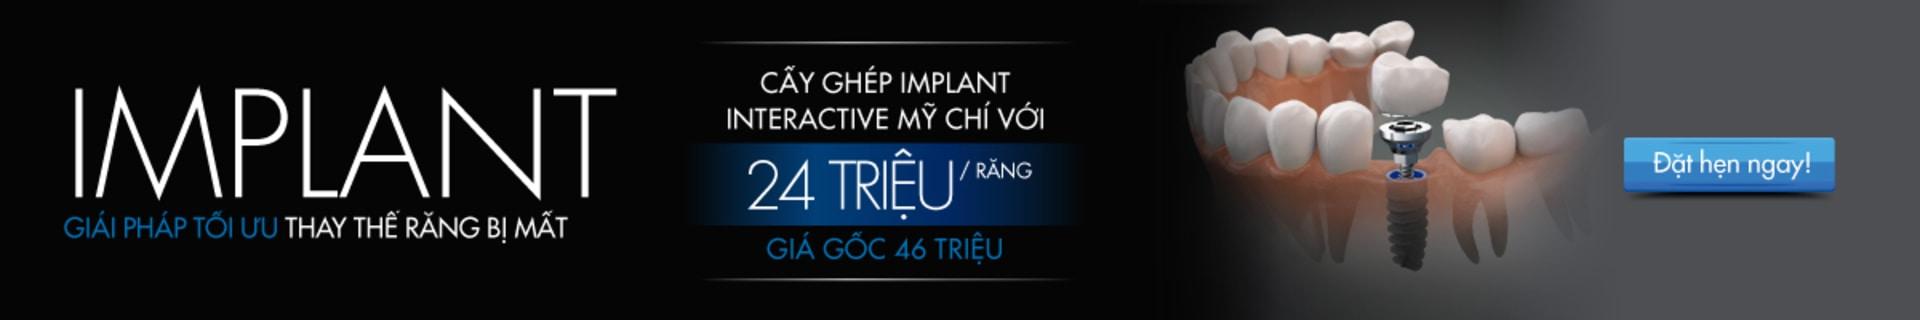 Nha khoa Westcoast: Ưu đãi cấy ghép Implant